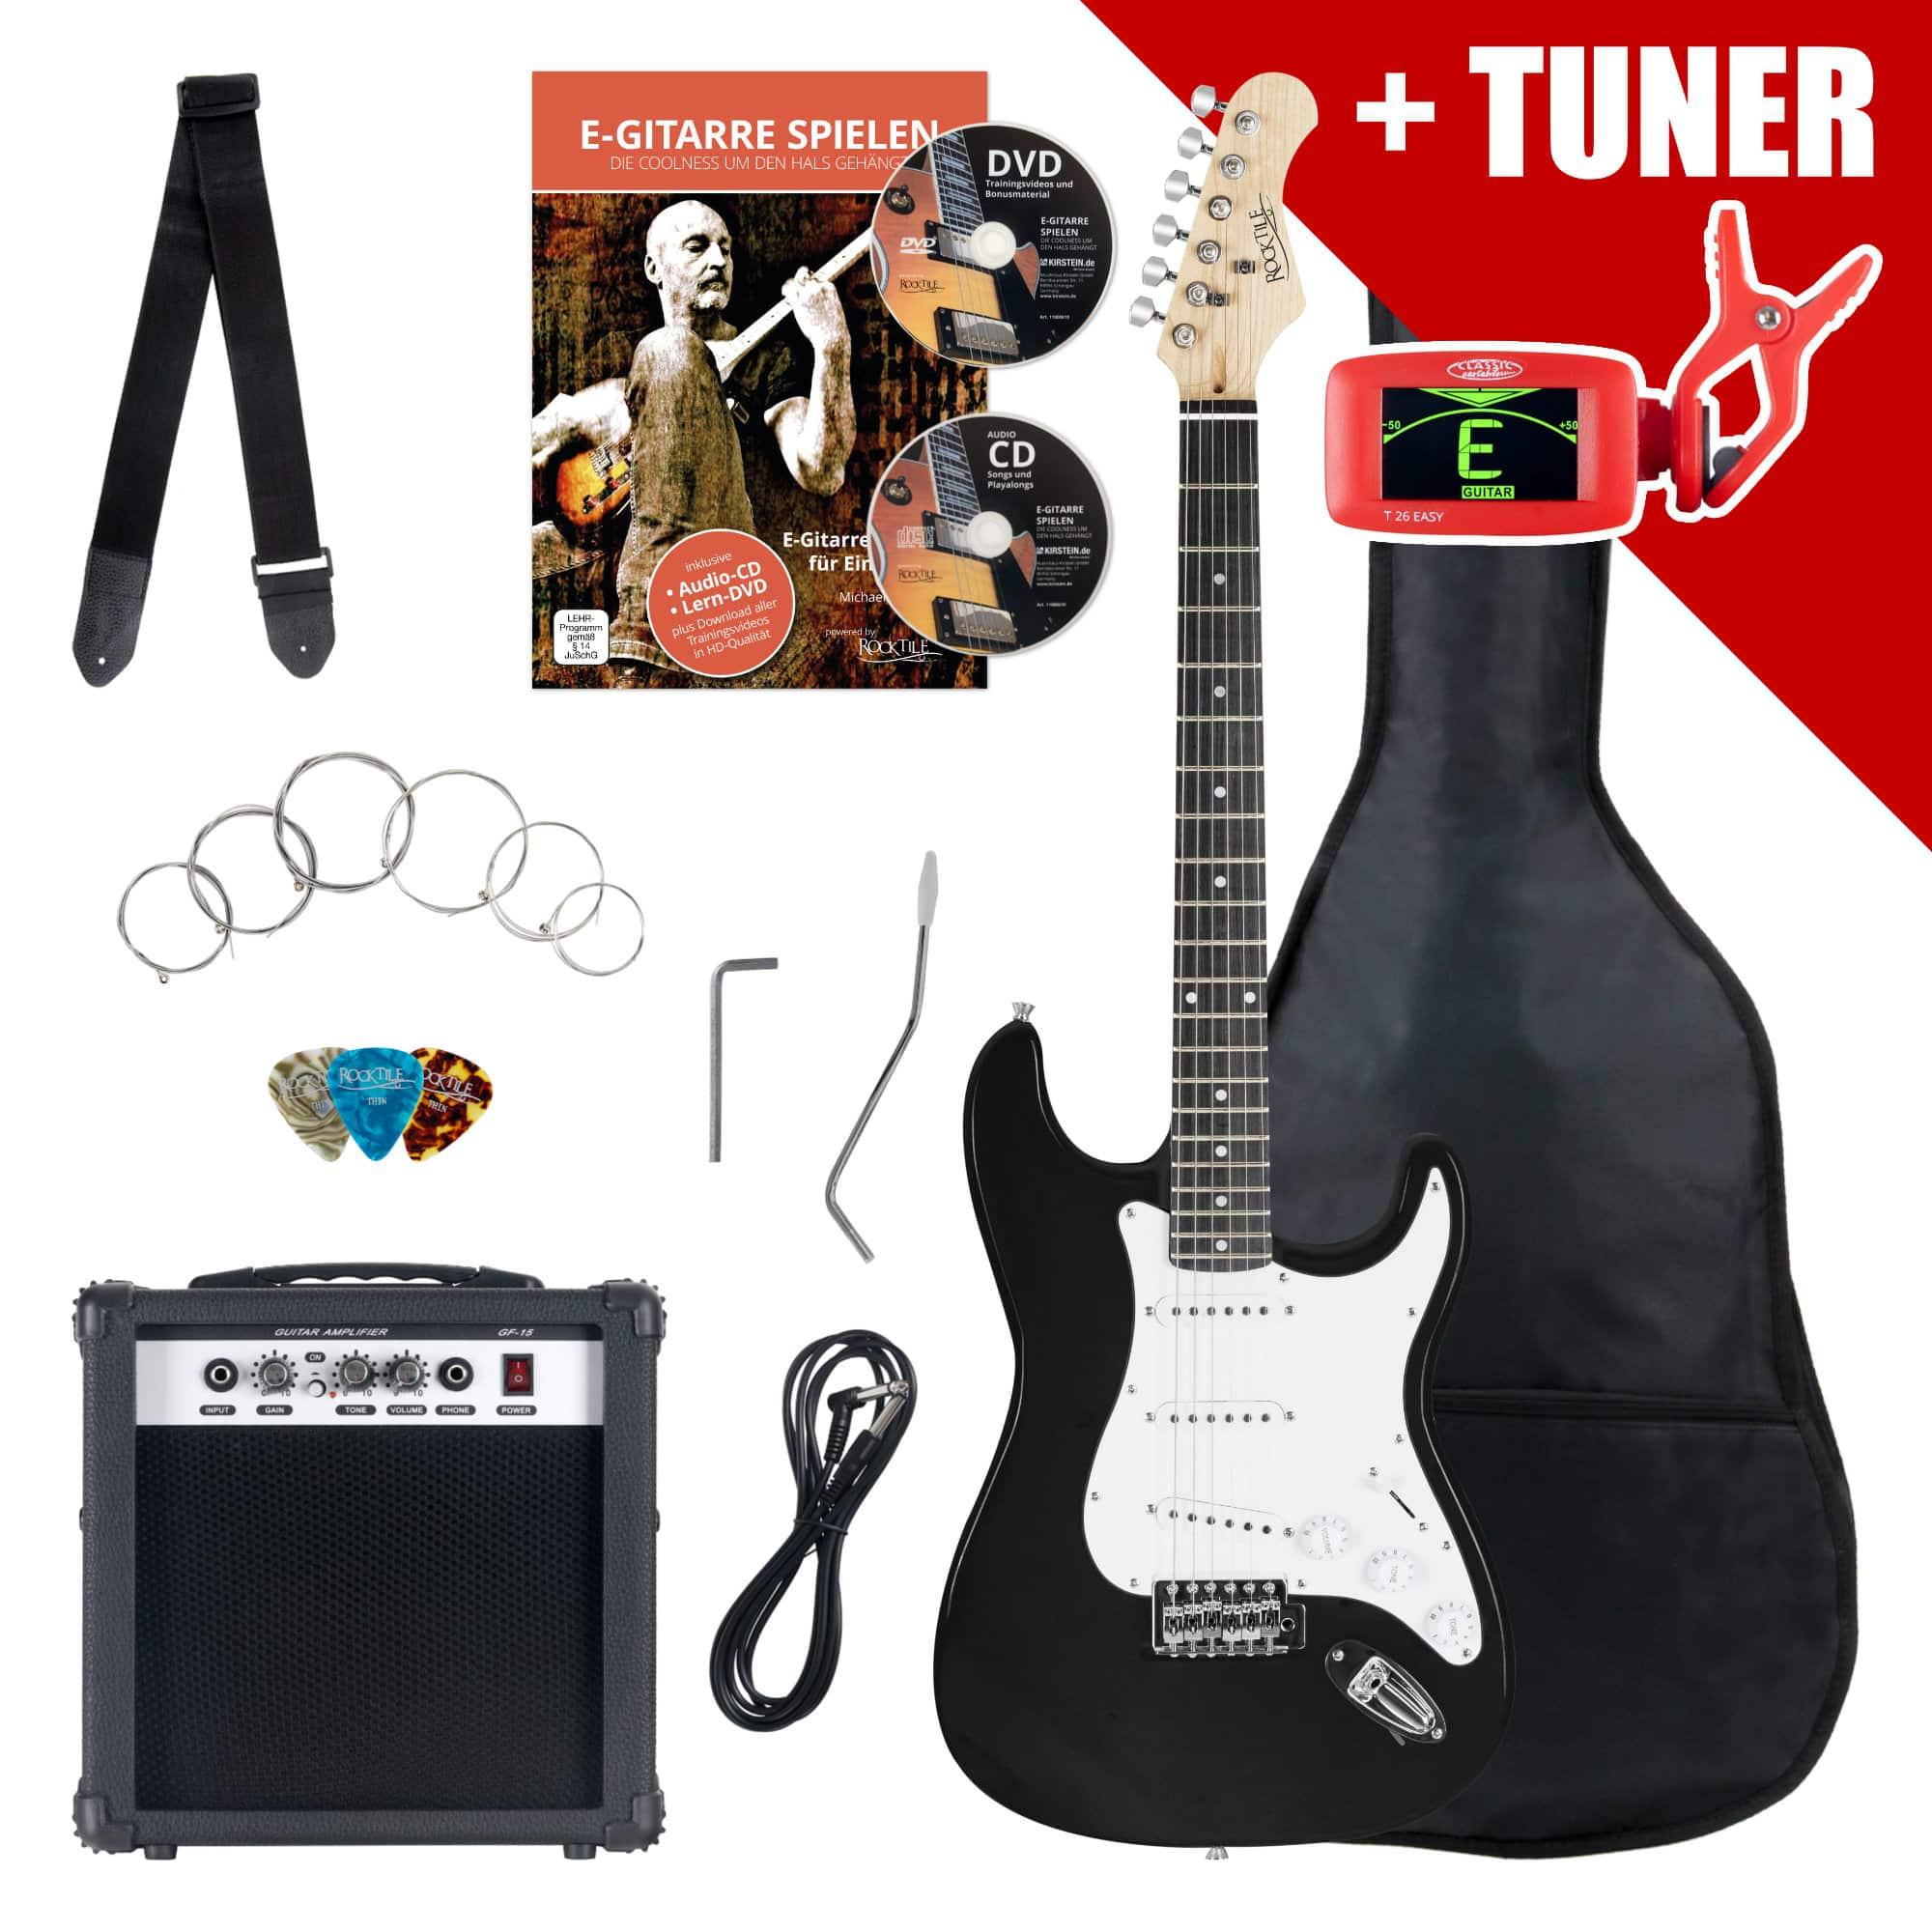 Rocktile ST Pack E Gitarre Set Schwarz inkl. Verstärker, Tasche, Stimmgerät, Kabel, Gurt, Saiten und Schule inkl. CD|DVD